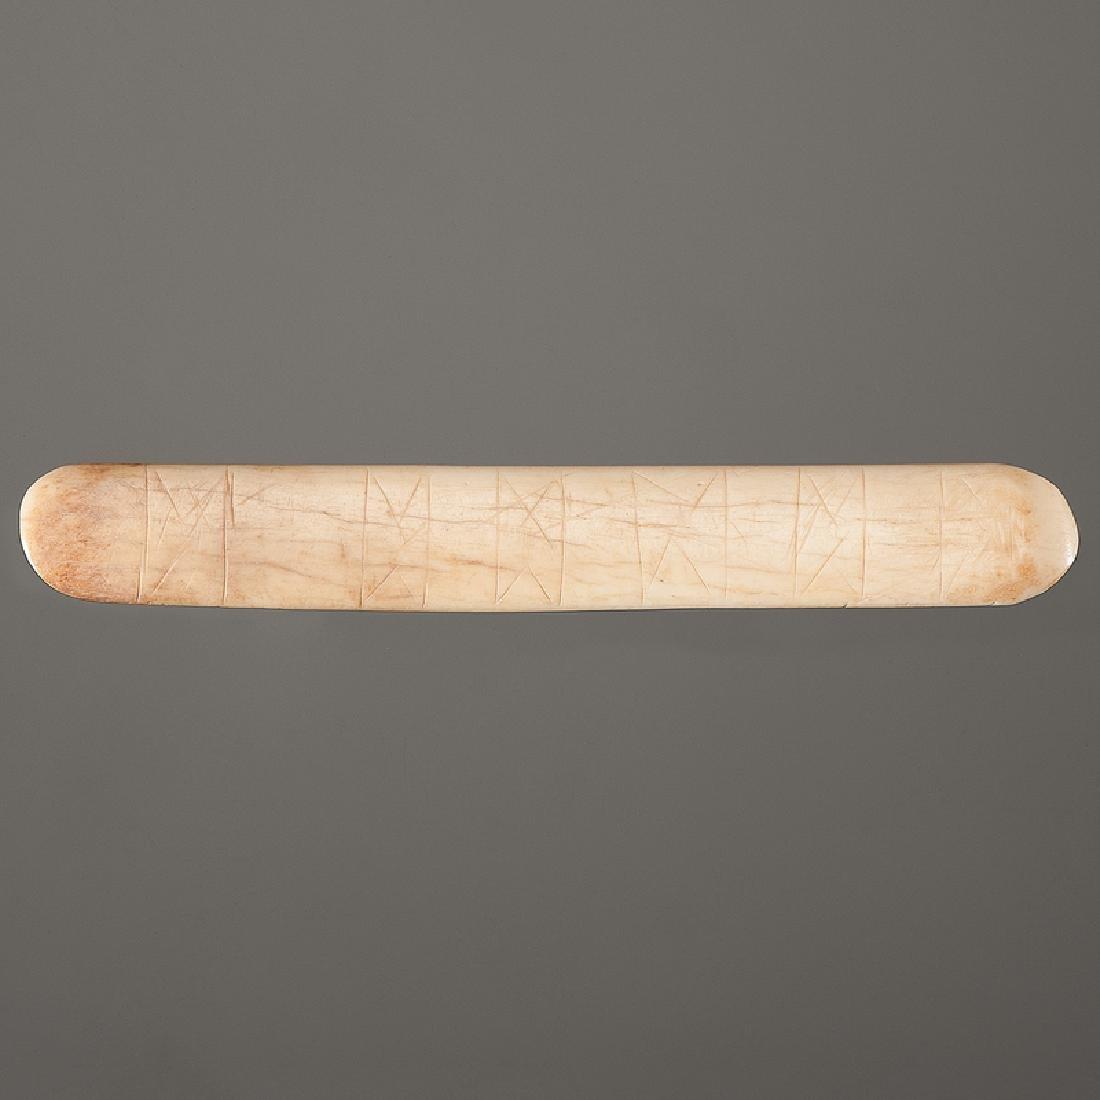 An Engraved Bone Spatulate Tool